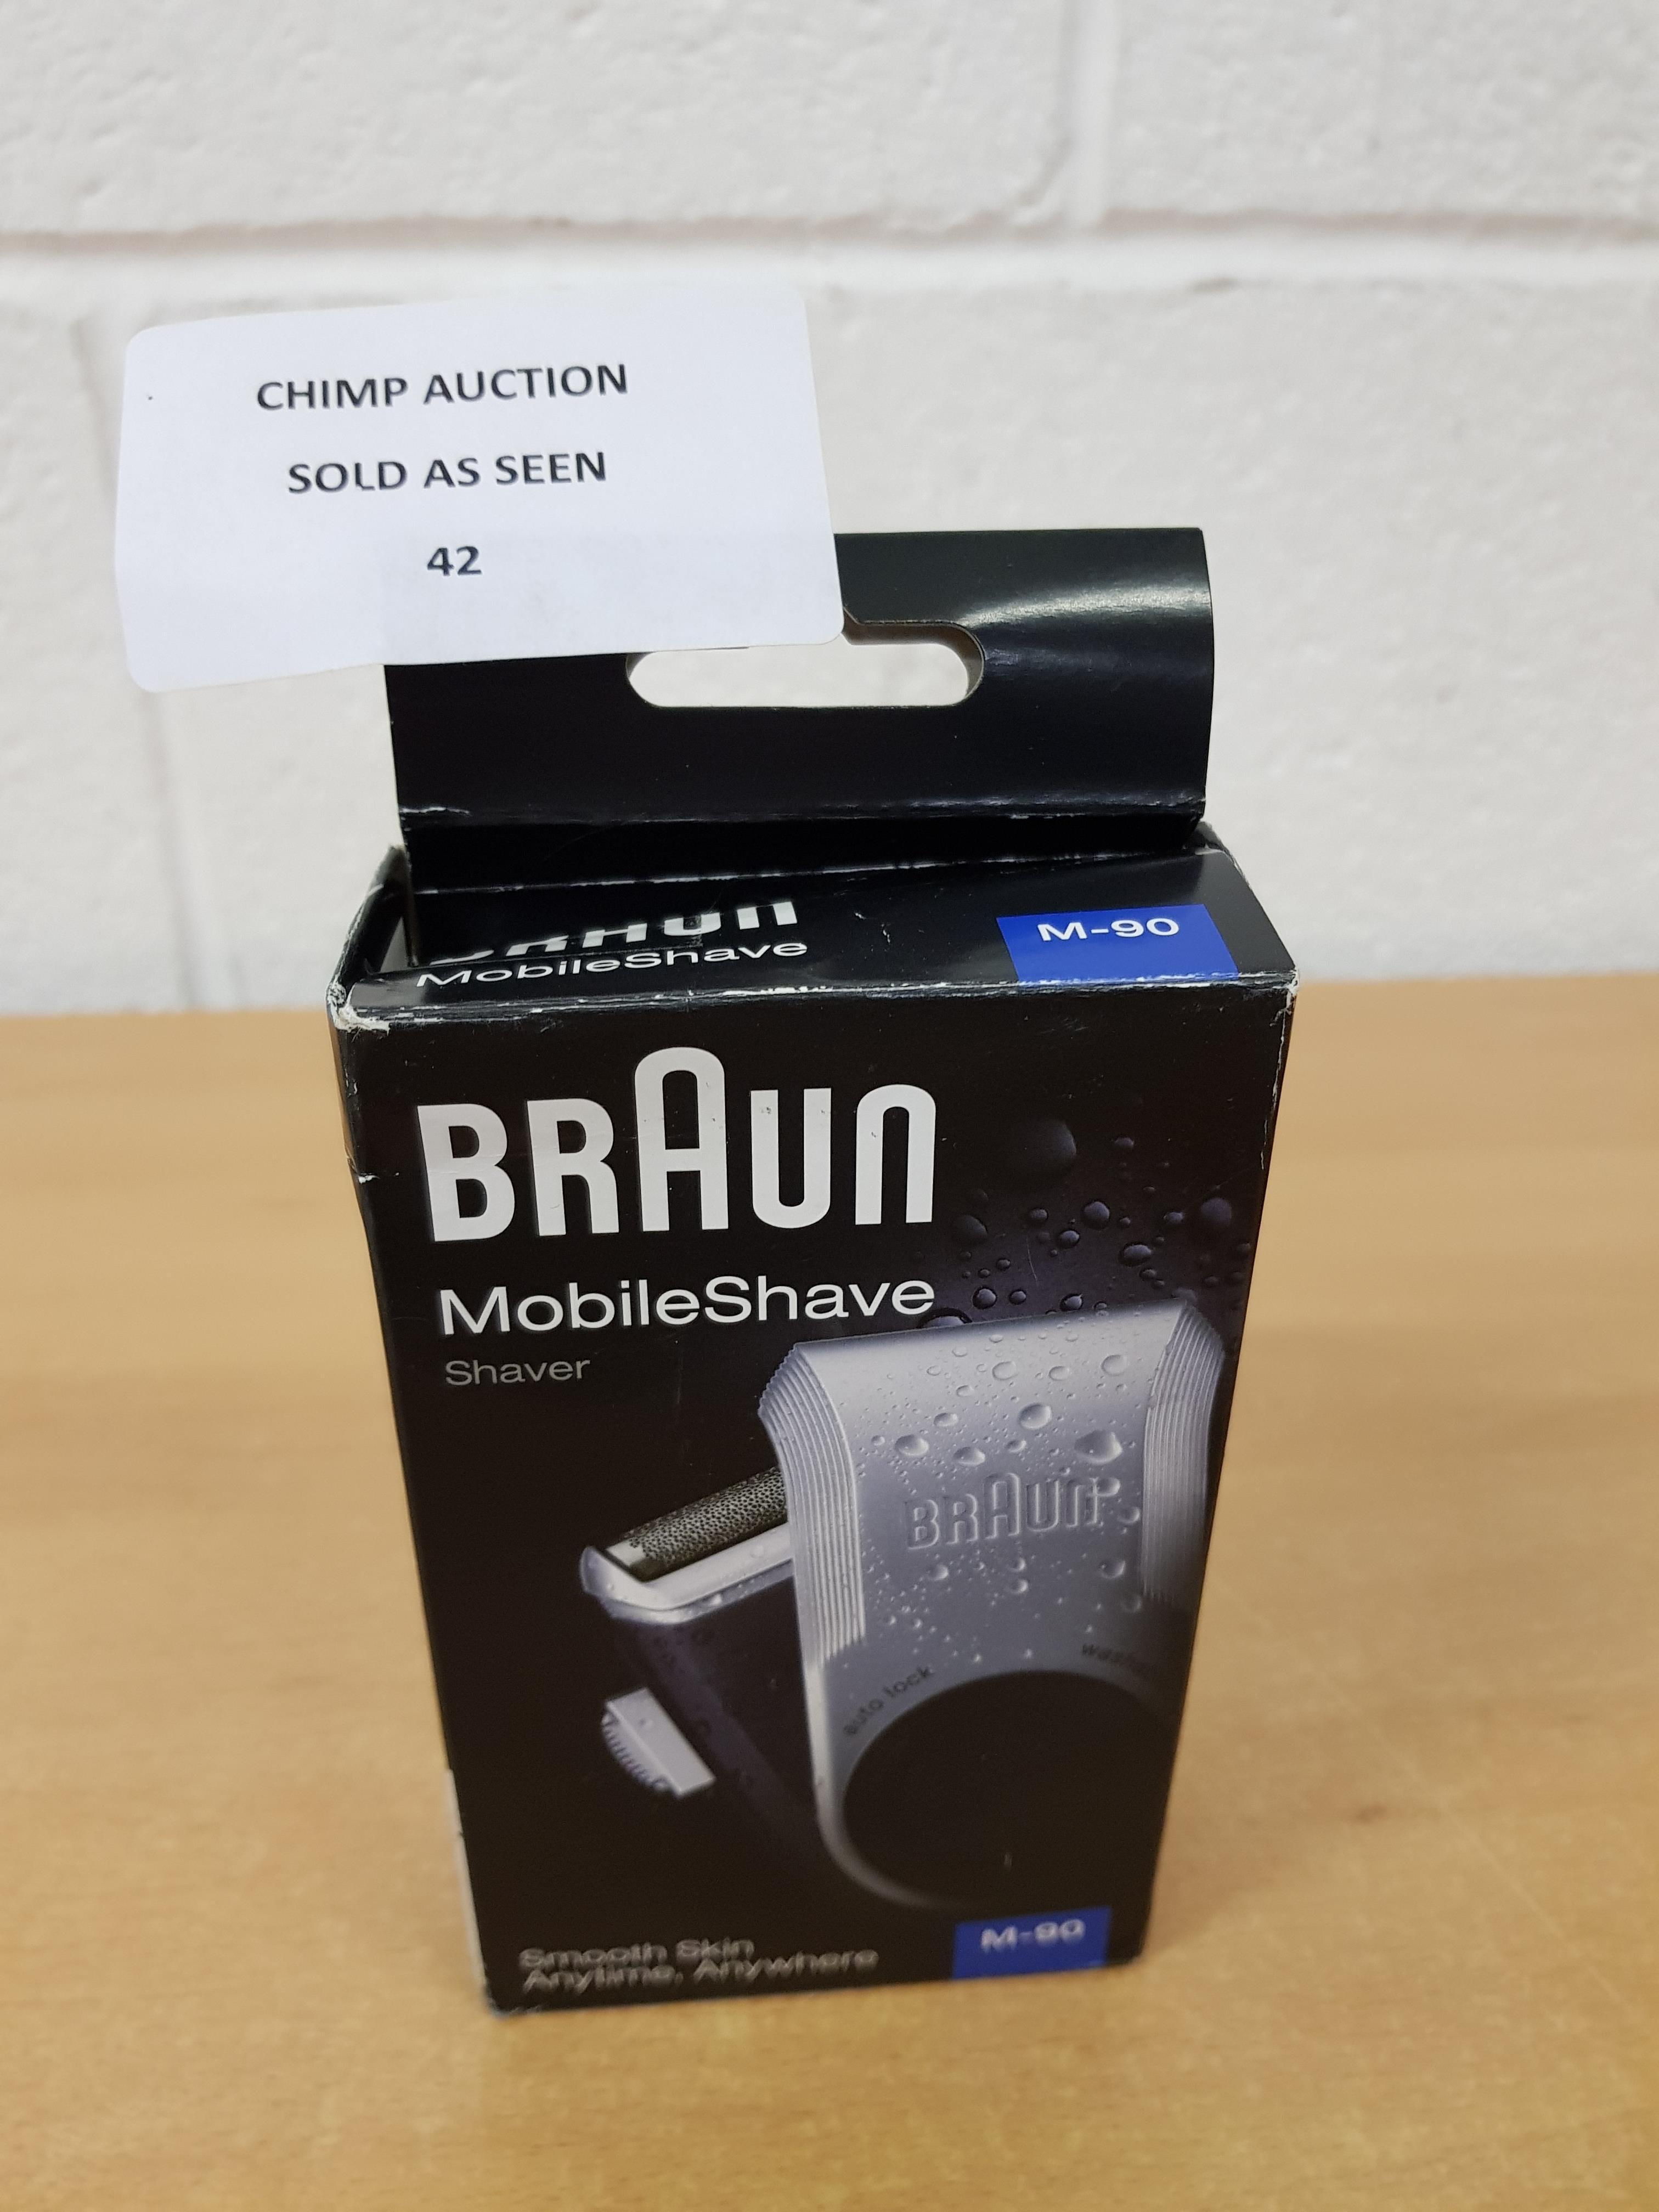 Lot 42 - Braun PocketGo M90 MobileShave Portable Shaver